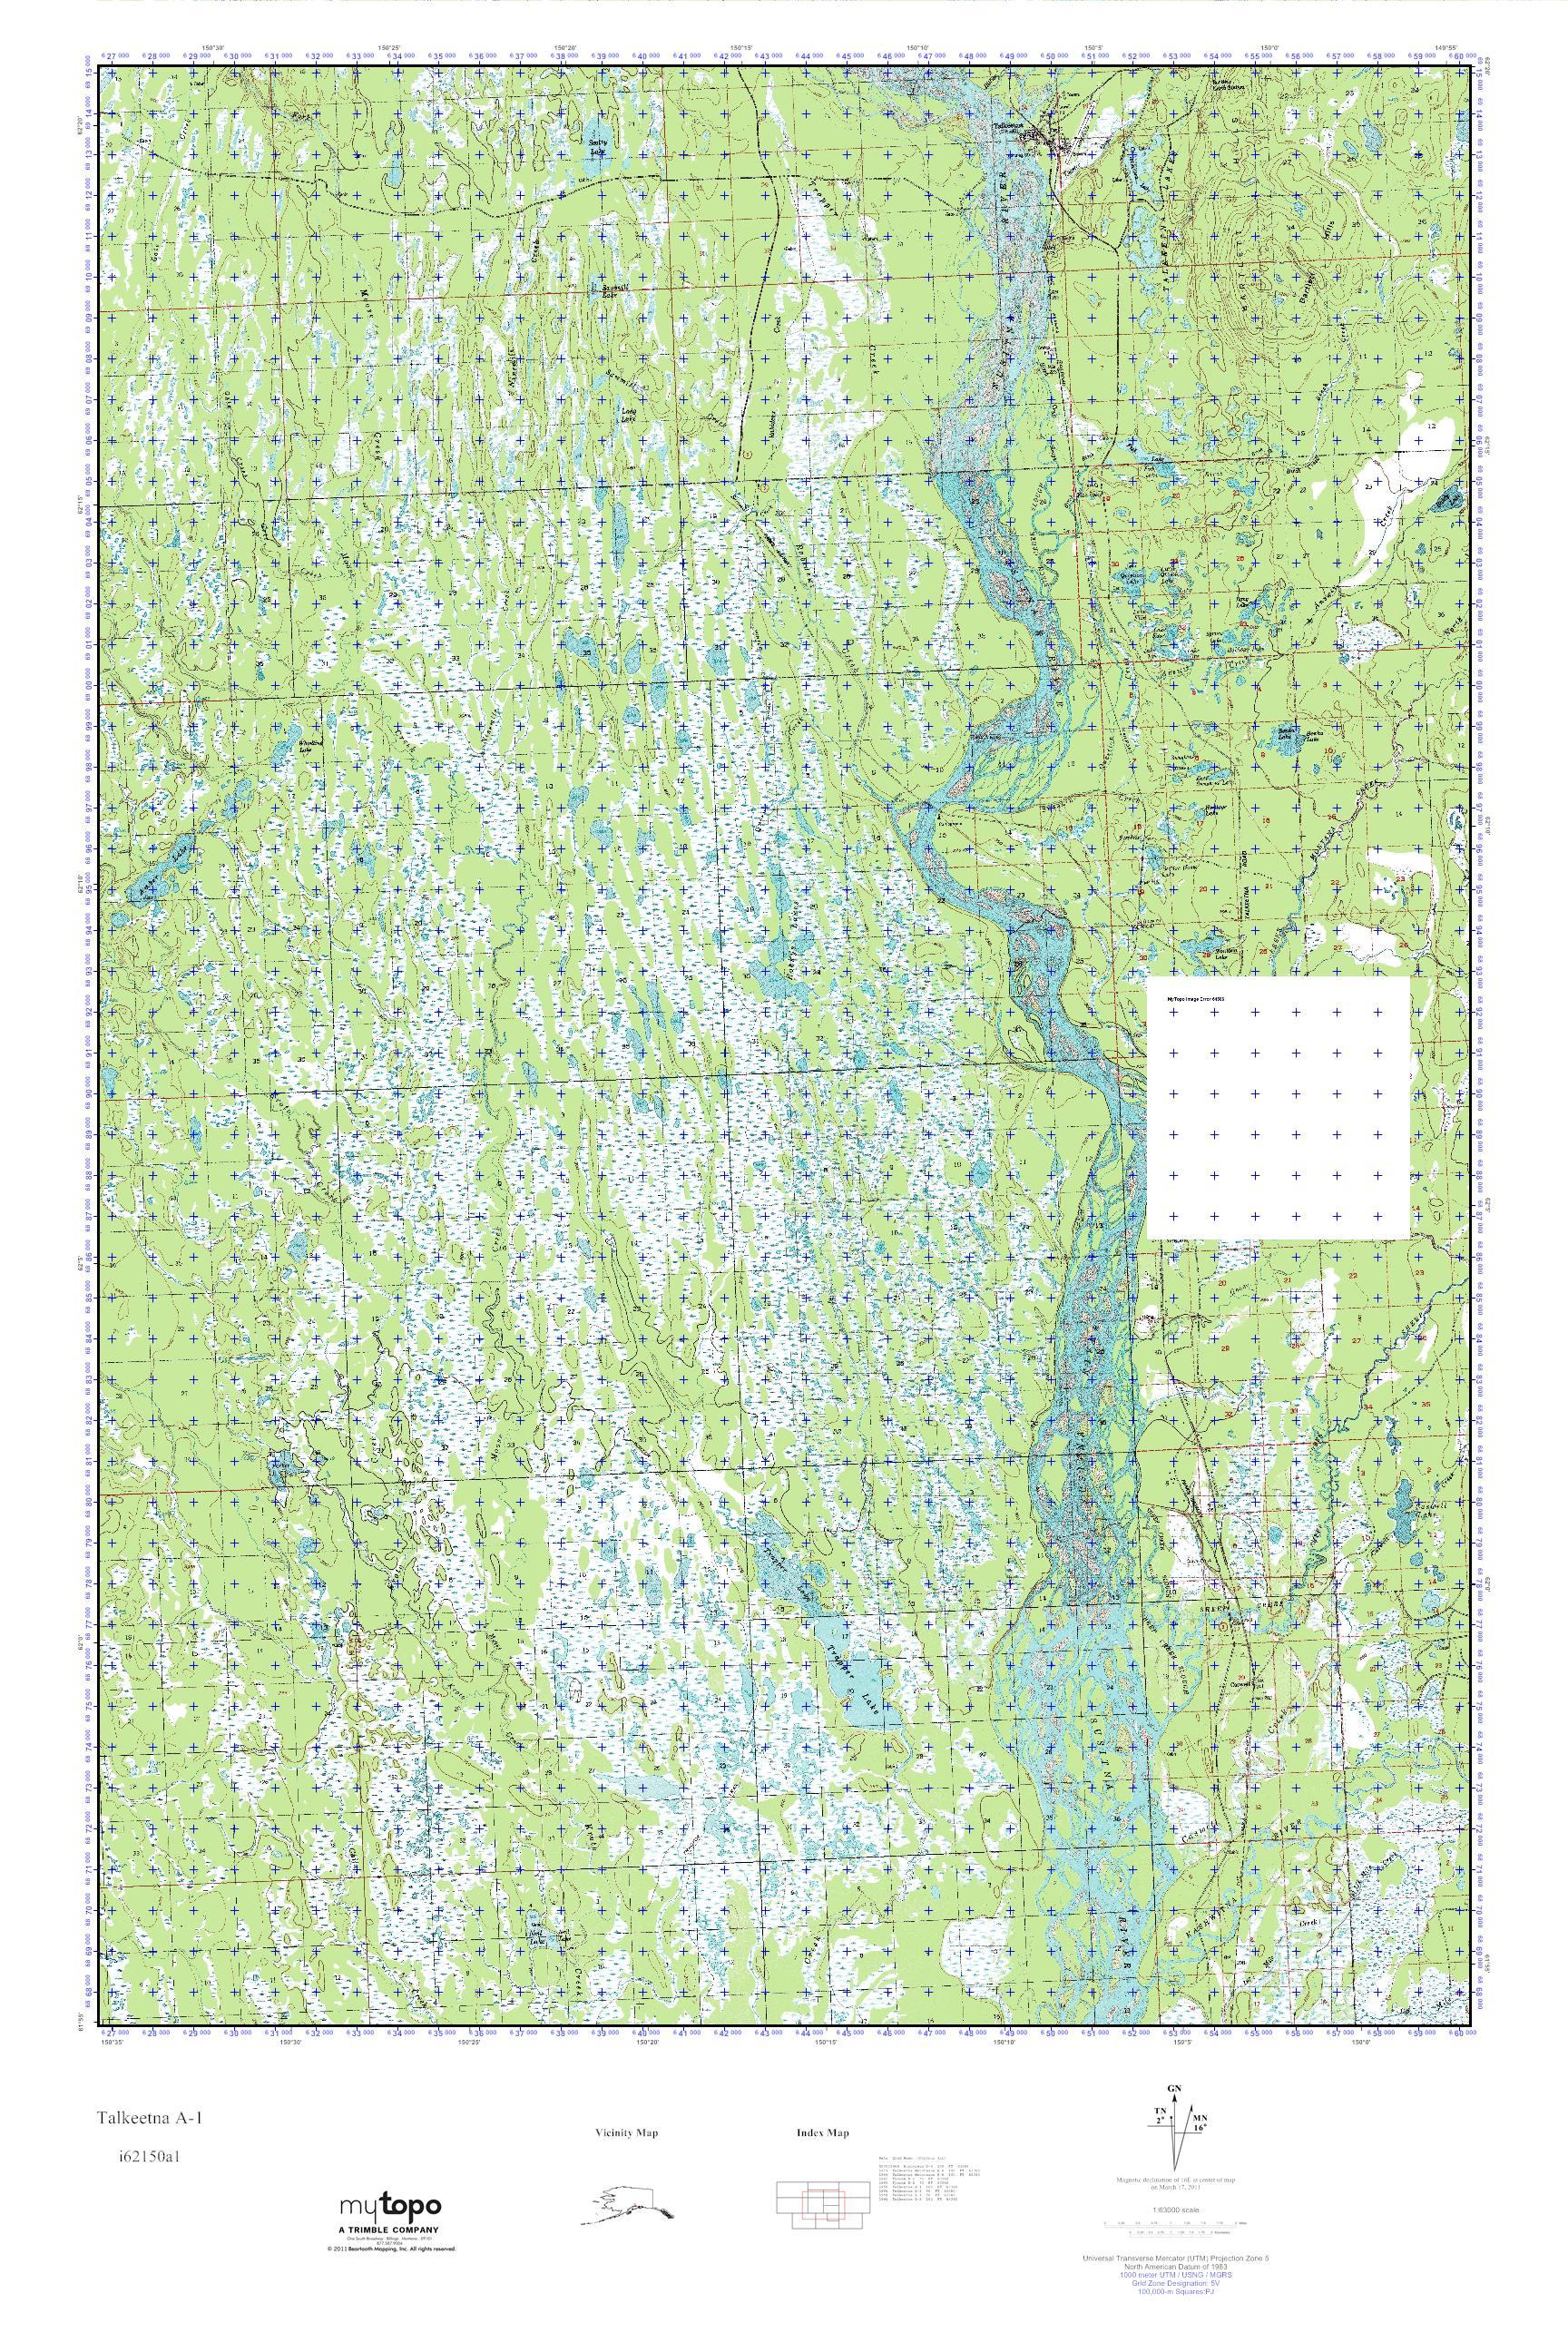 MyTopo Talkeetna A-1, Alaska USGS Quad Topo Map